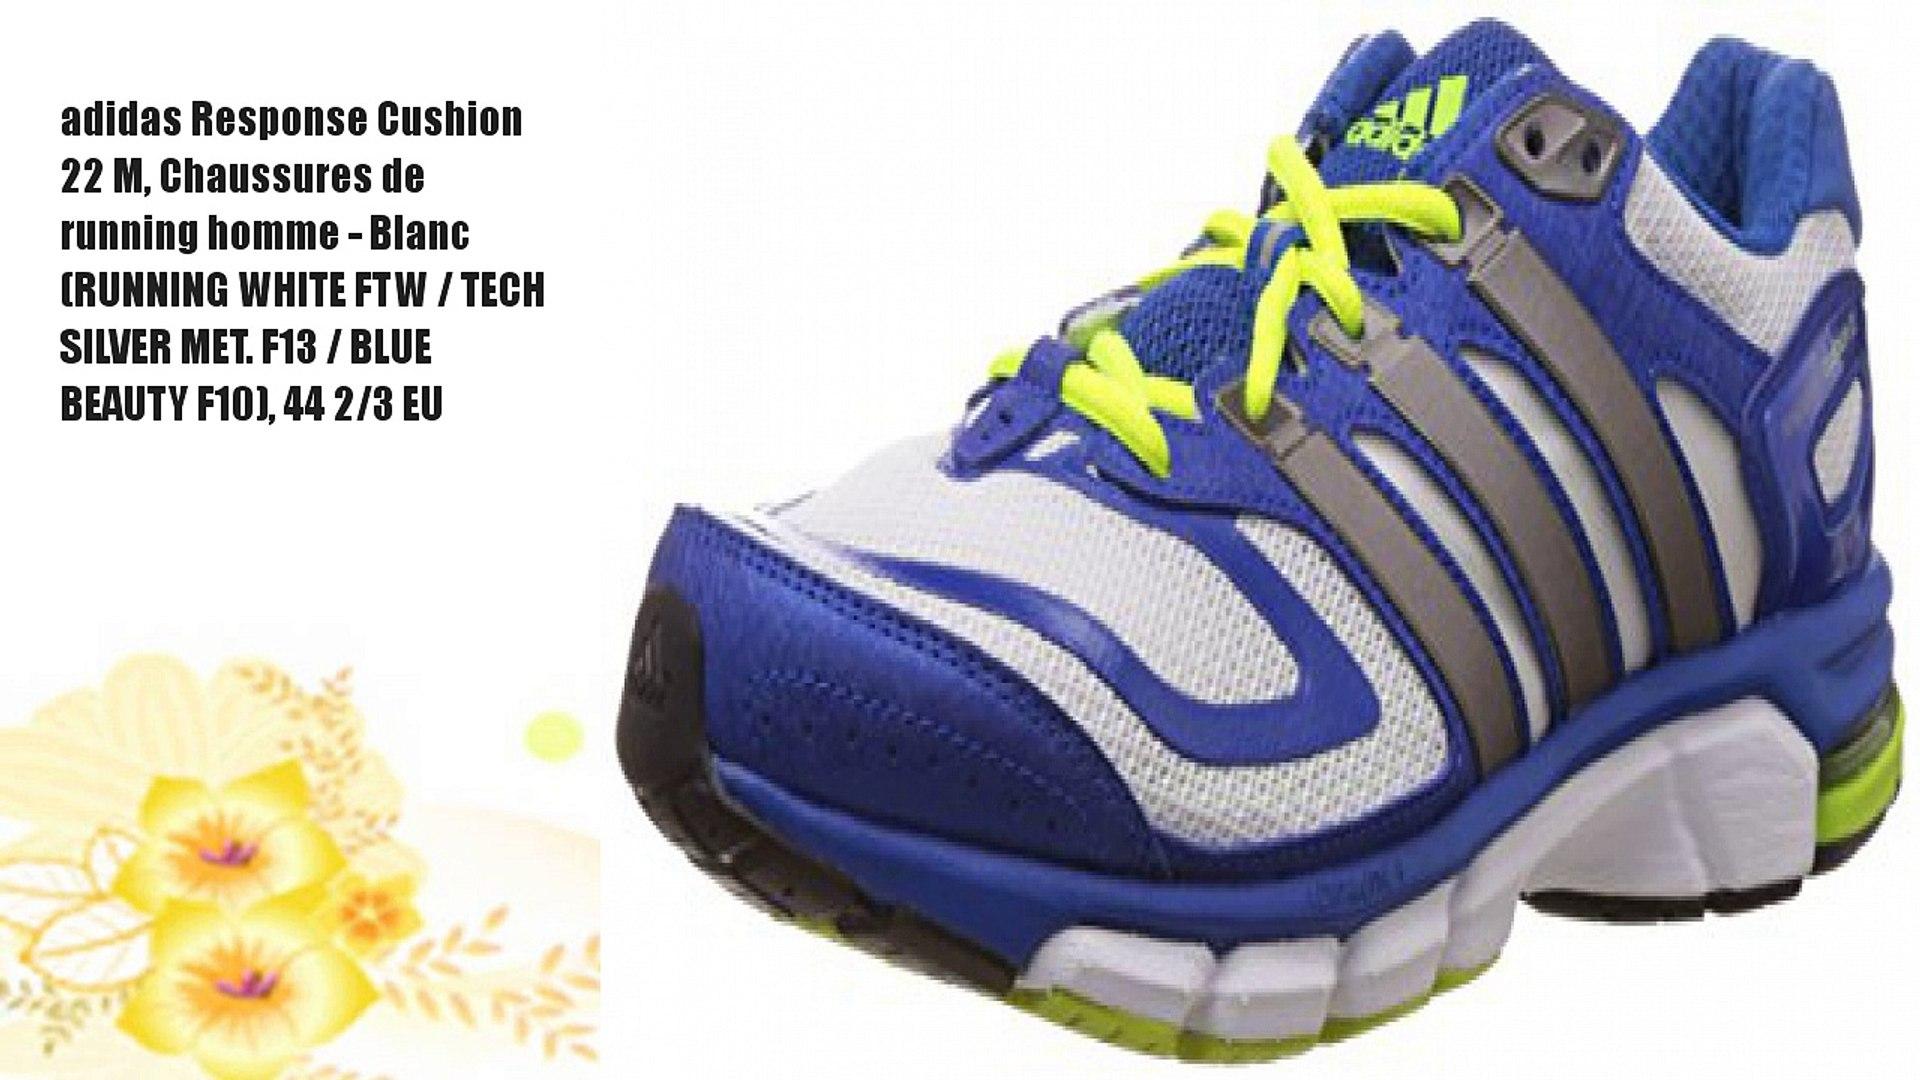 photos officielles 1539c 8a77e adidas Response Cushion 22 M, Chaussures de running